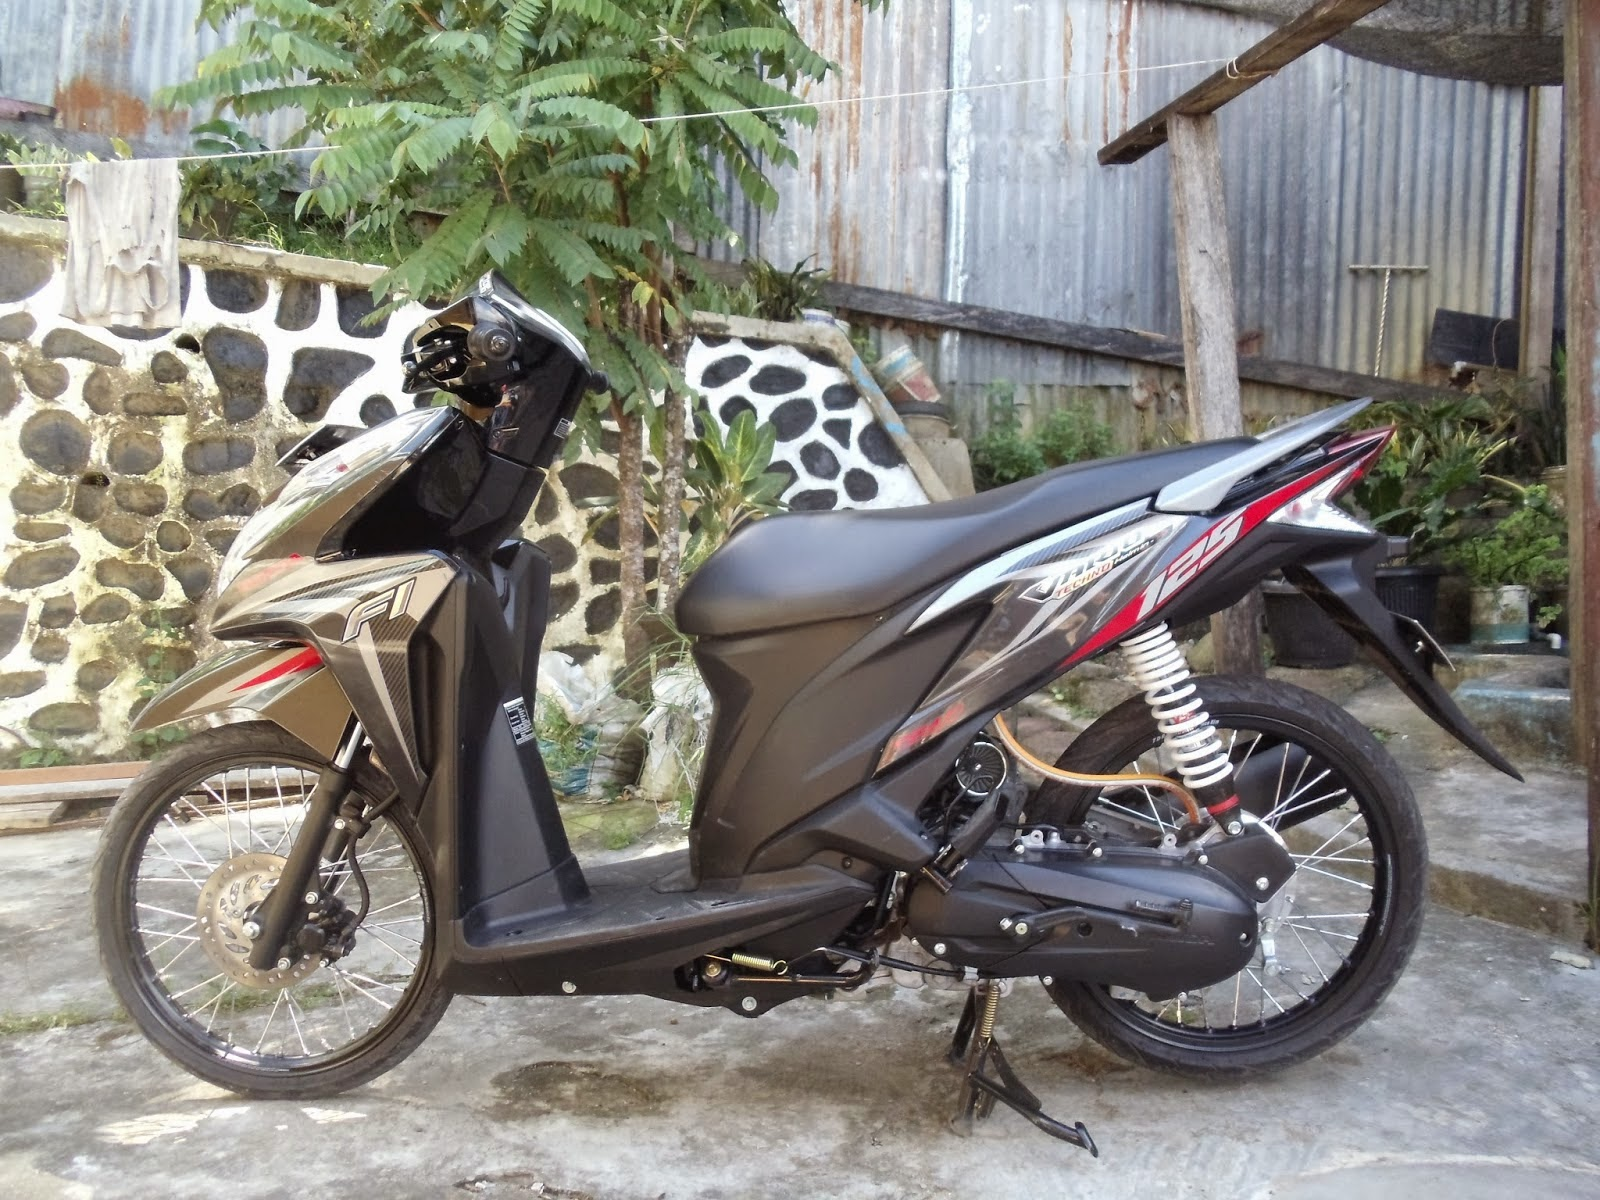 Modifikasi Motor Honda Vario CBS 125 Fi Terbaru